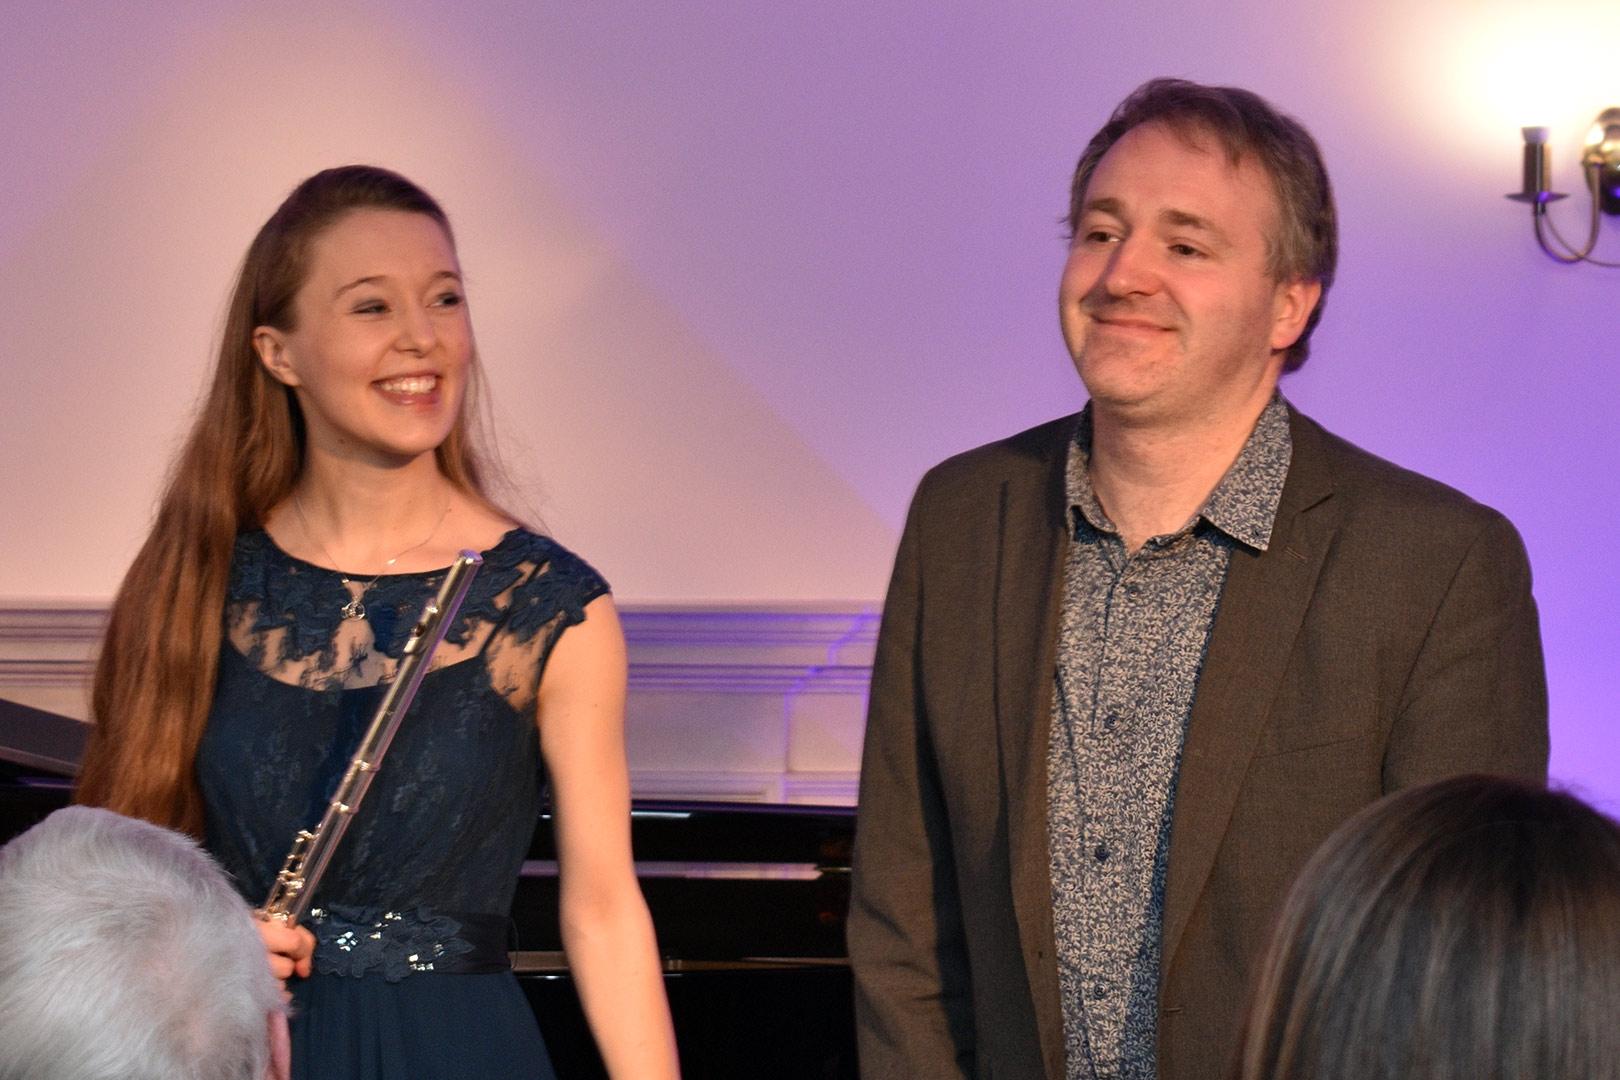 Emma Halnan & Daniel King Smith at Breinton